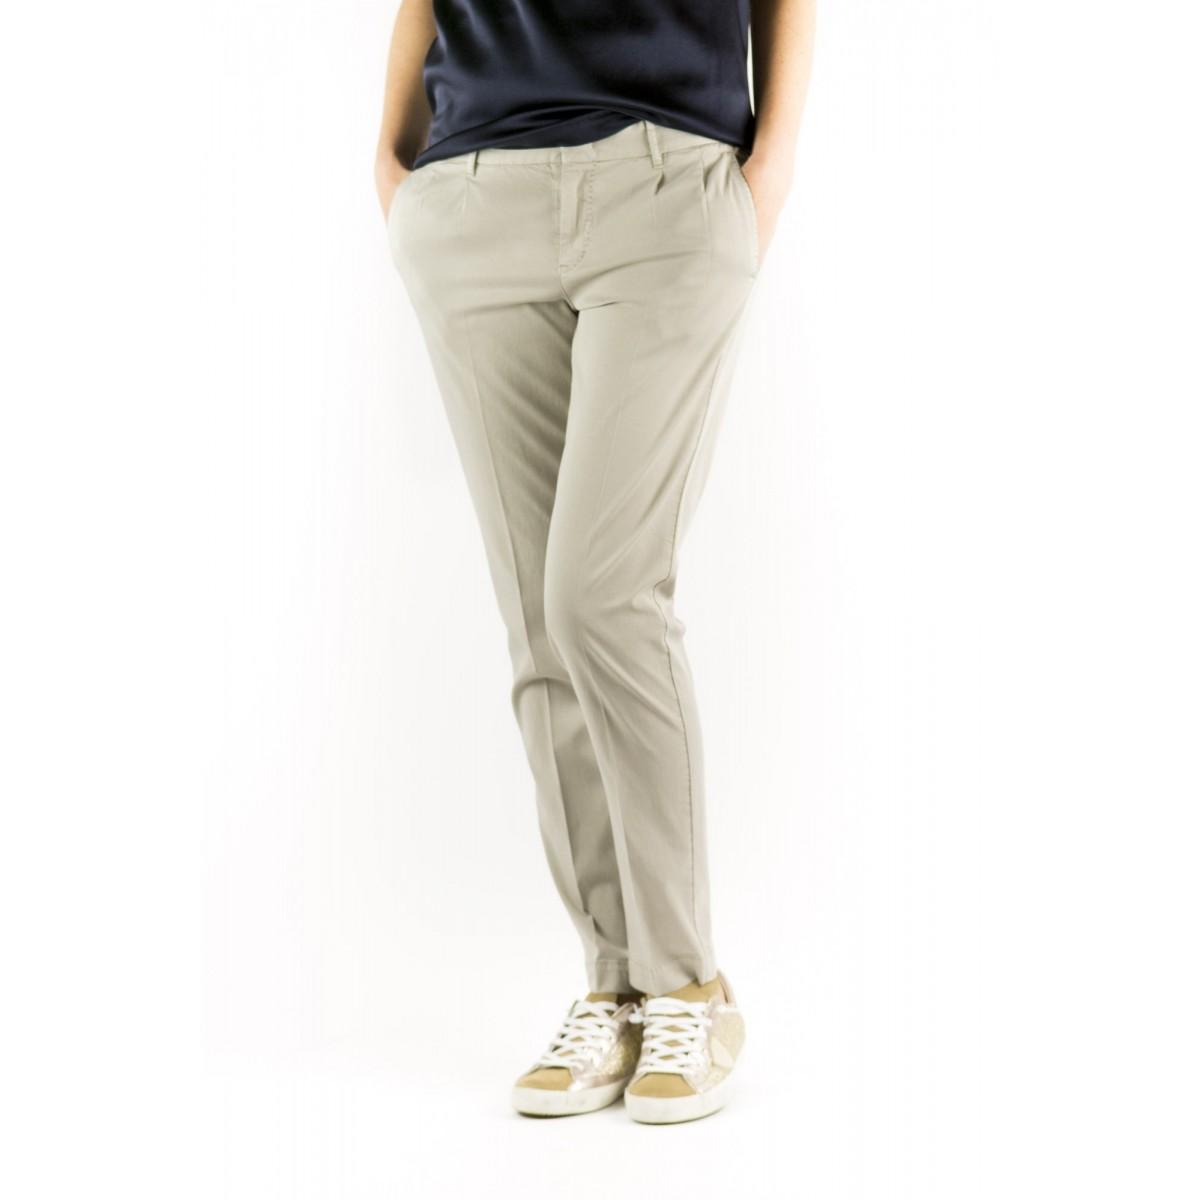 Pantalone donna Pt0w - Vtc2 eb65 cotone strech 0040 - beige